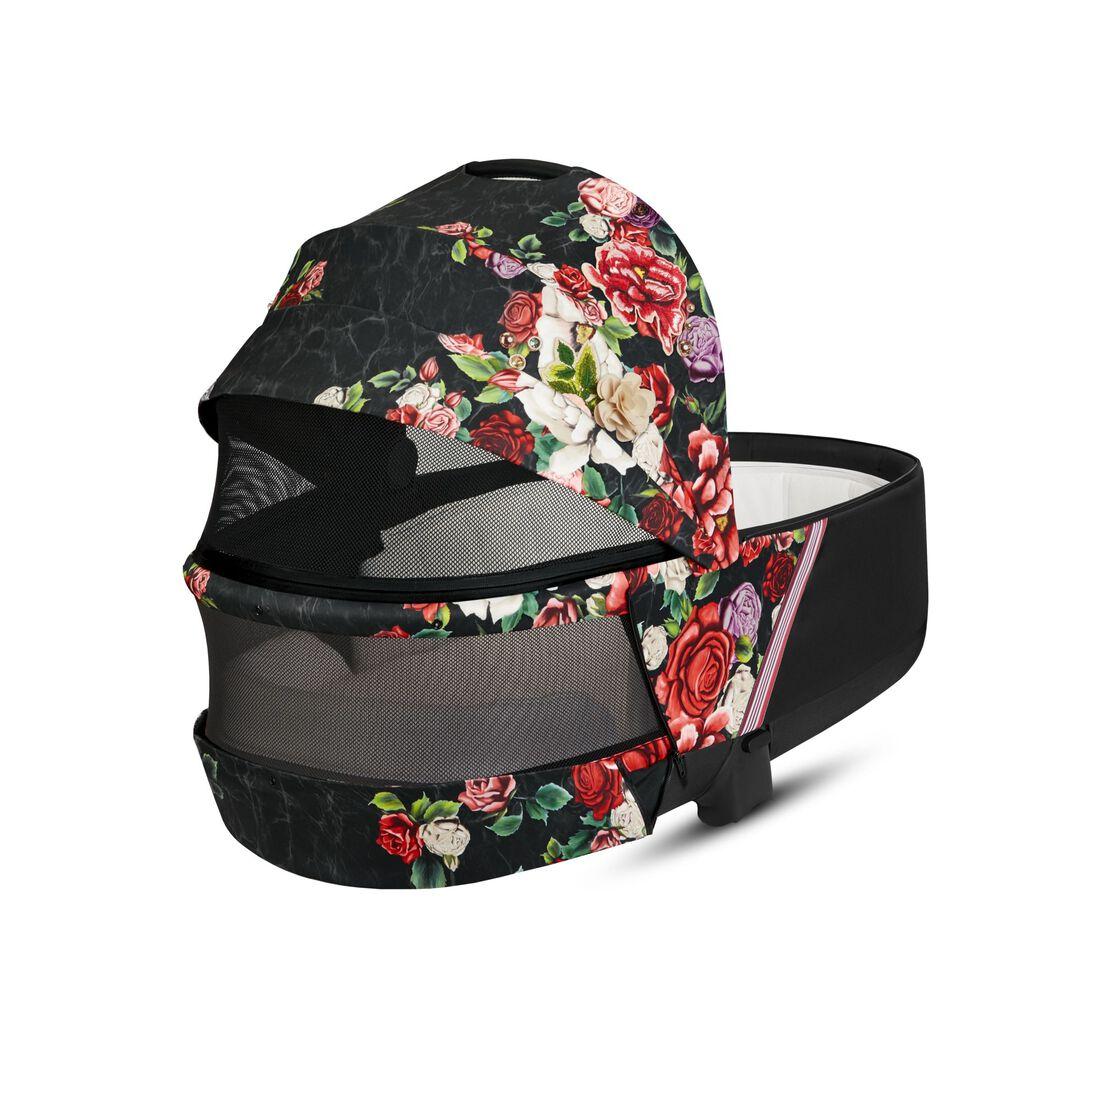 CYBEX Priam Lux Carry Cot - Spring Blossom Dark in Spring Blossom Dark large Bild 3